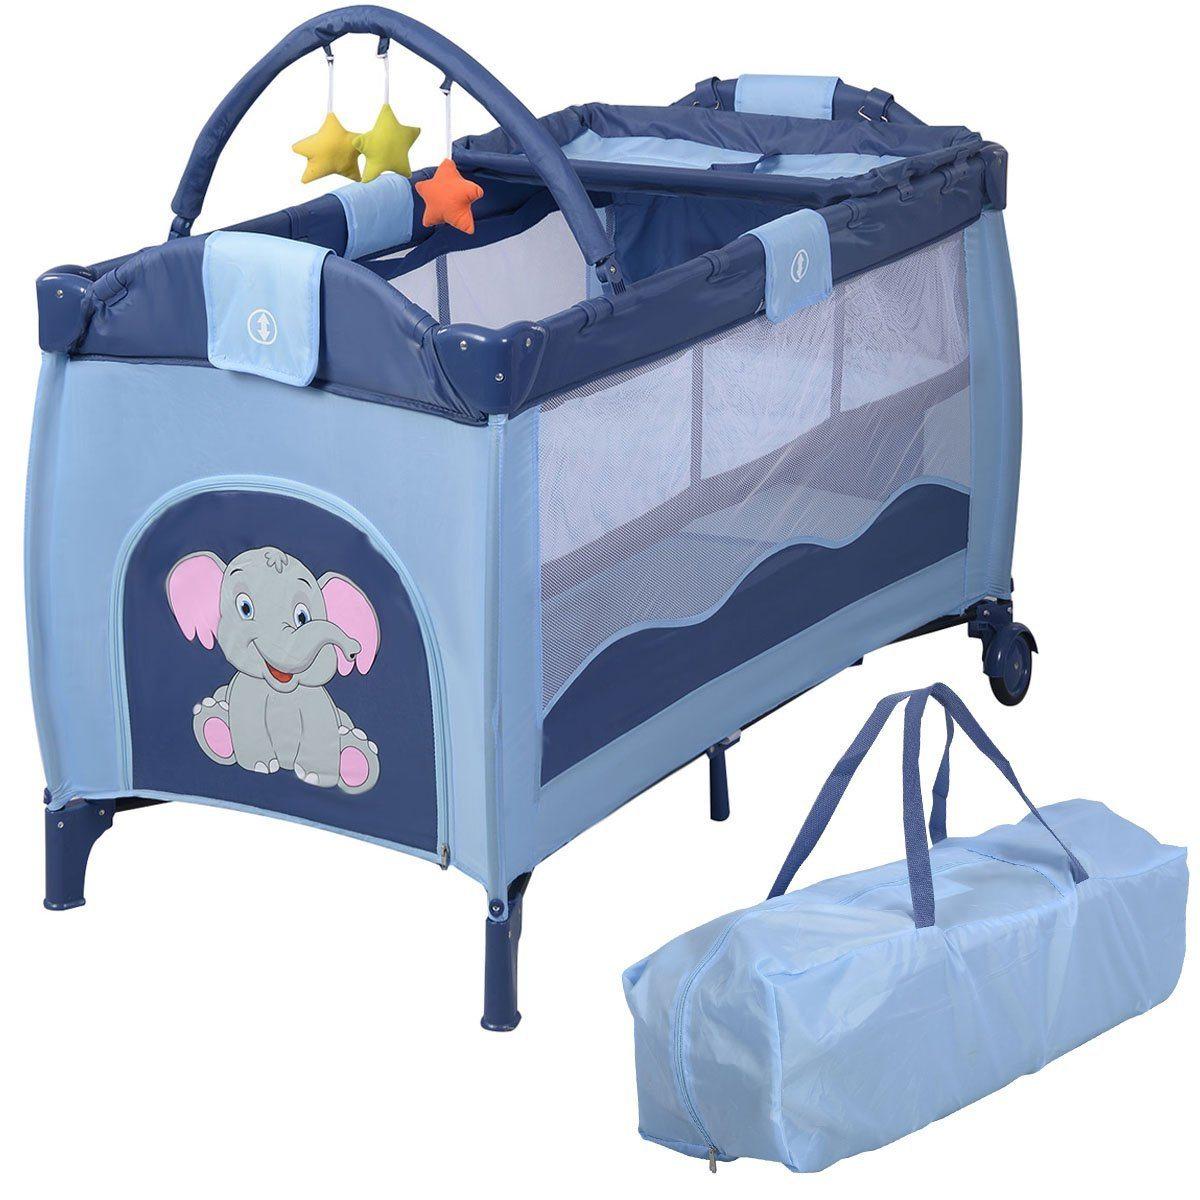 fds reisebett expertentesten. Black Bedroom Furniture Sets. Home Design Ideas